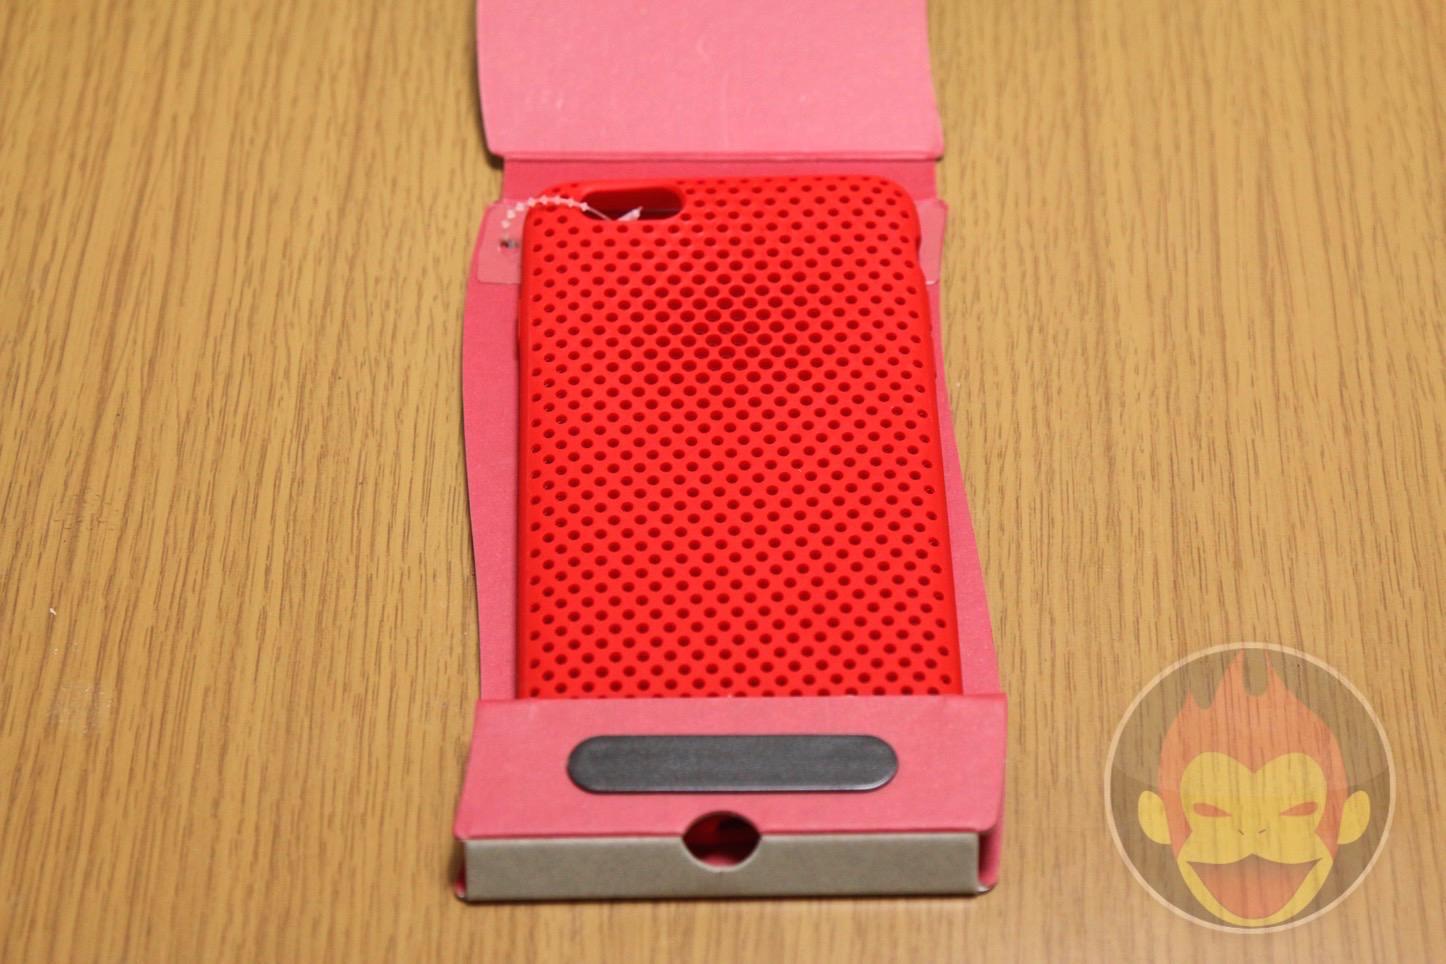 AndMesh Mesh Case for iPhone 6 Plus